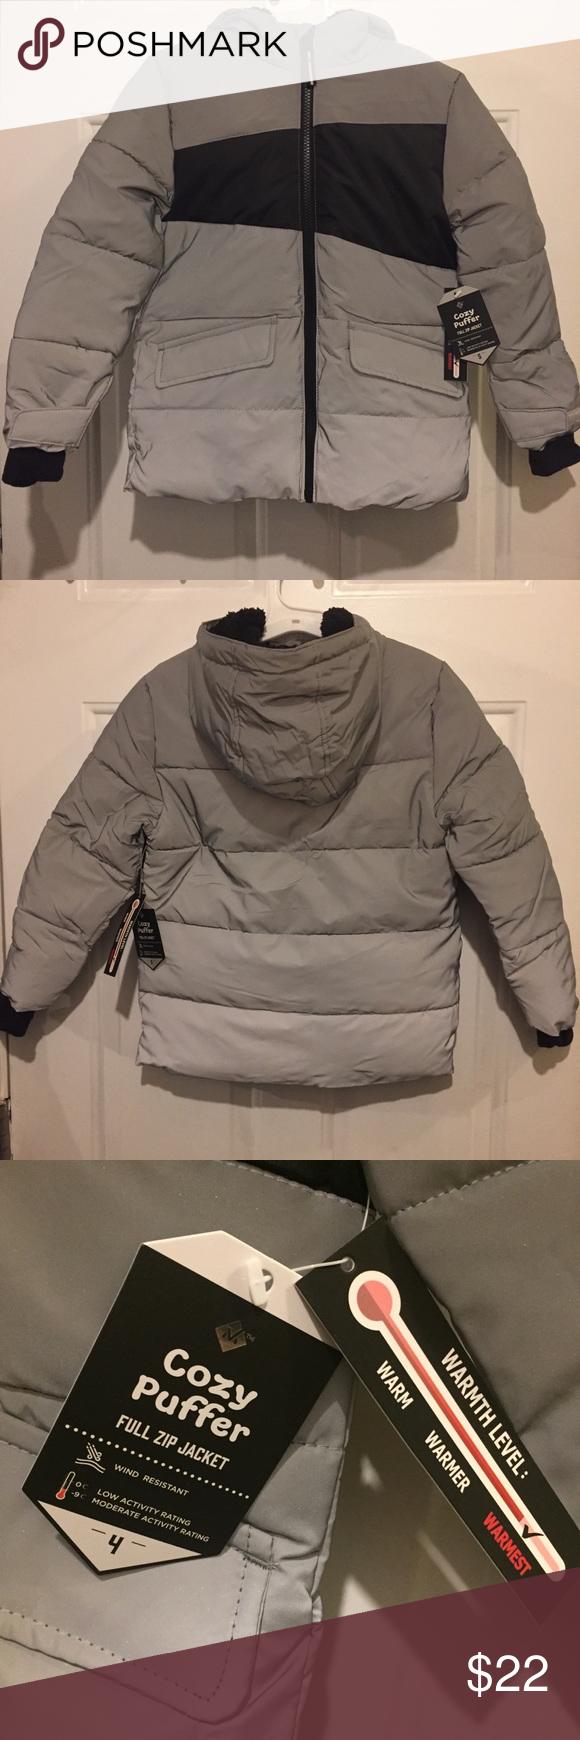 Member S Mark Boys Full Zip Cozy Puffer Jacket Jackets Puffer Jackets Clothes Design [ 1740 x 580 Pixel ]